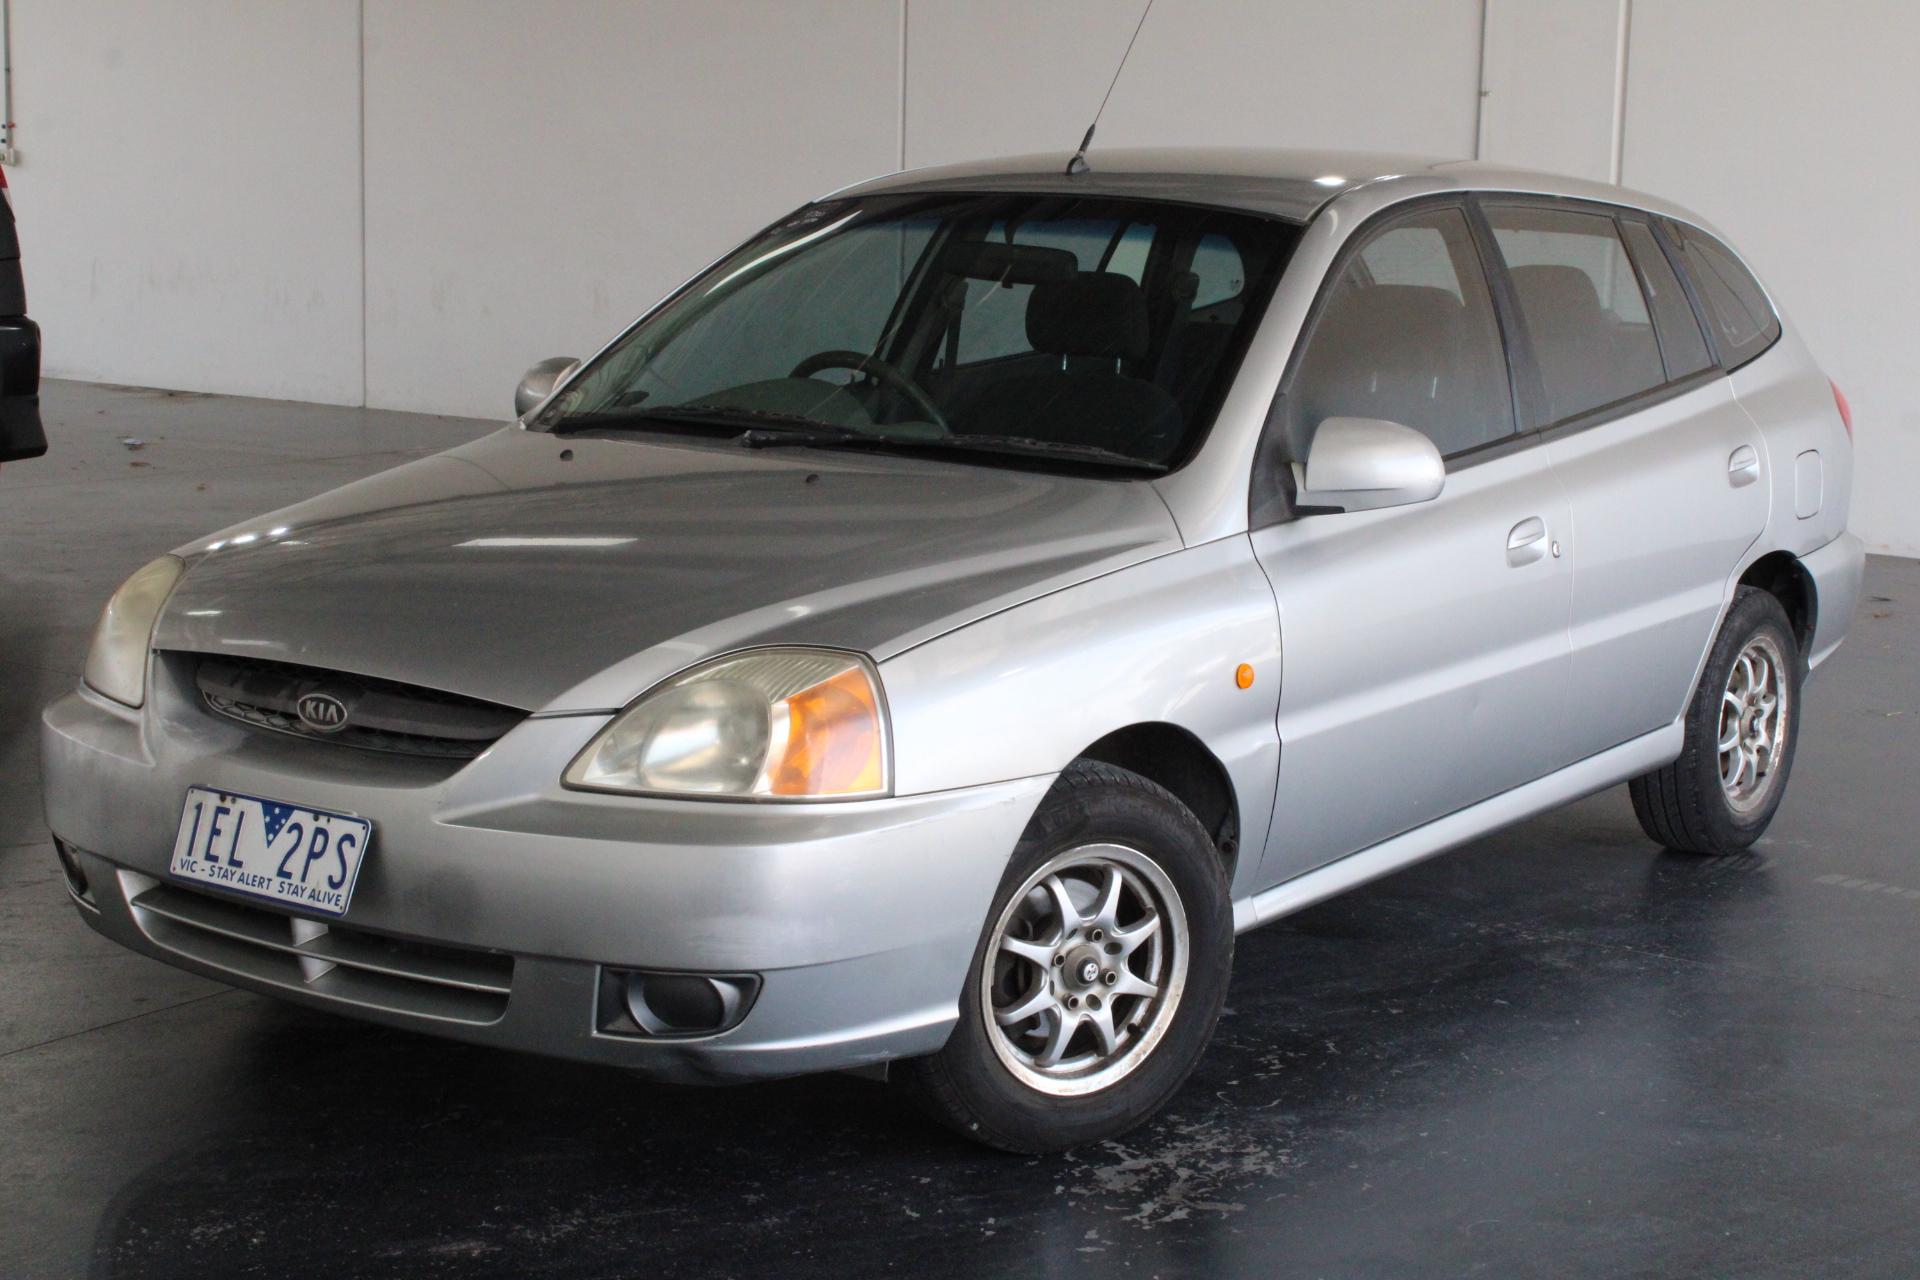 2003 Kia Rio BC Manual Hatchback